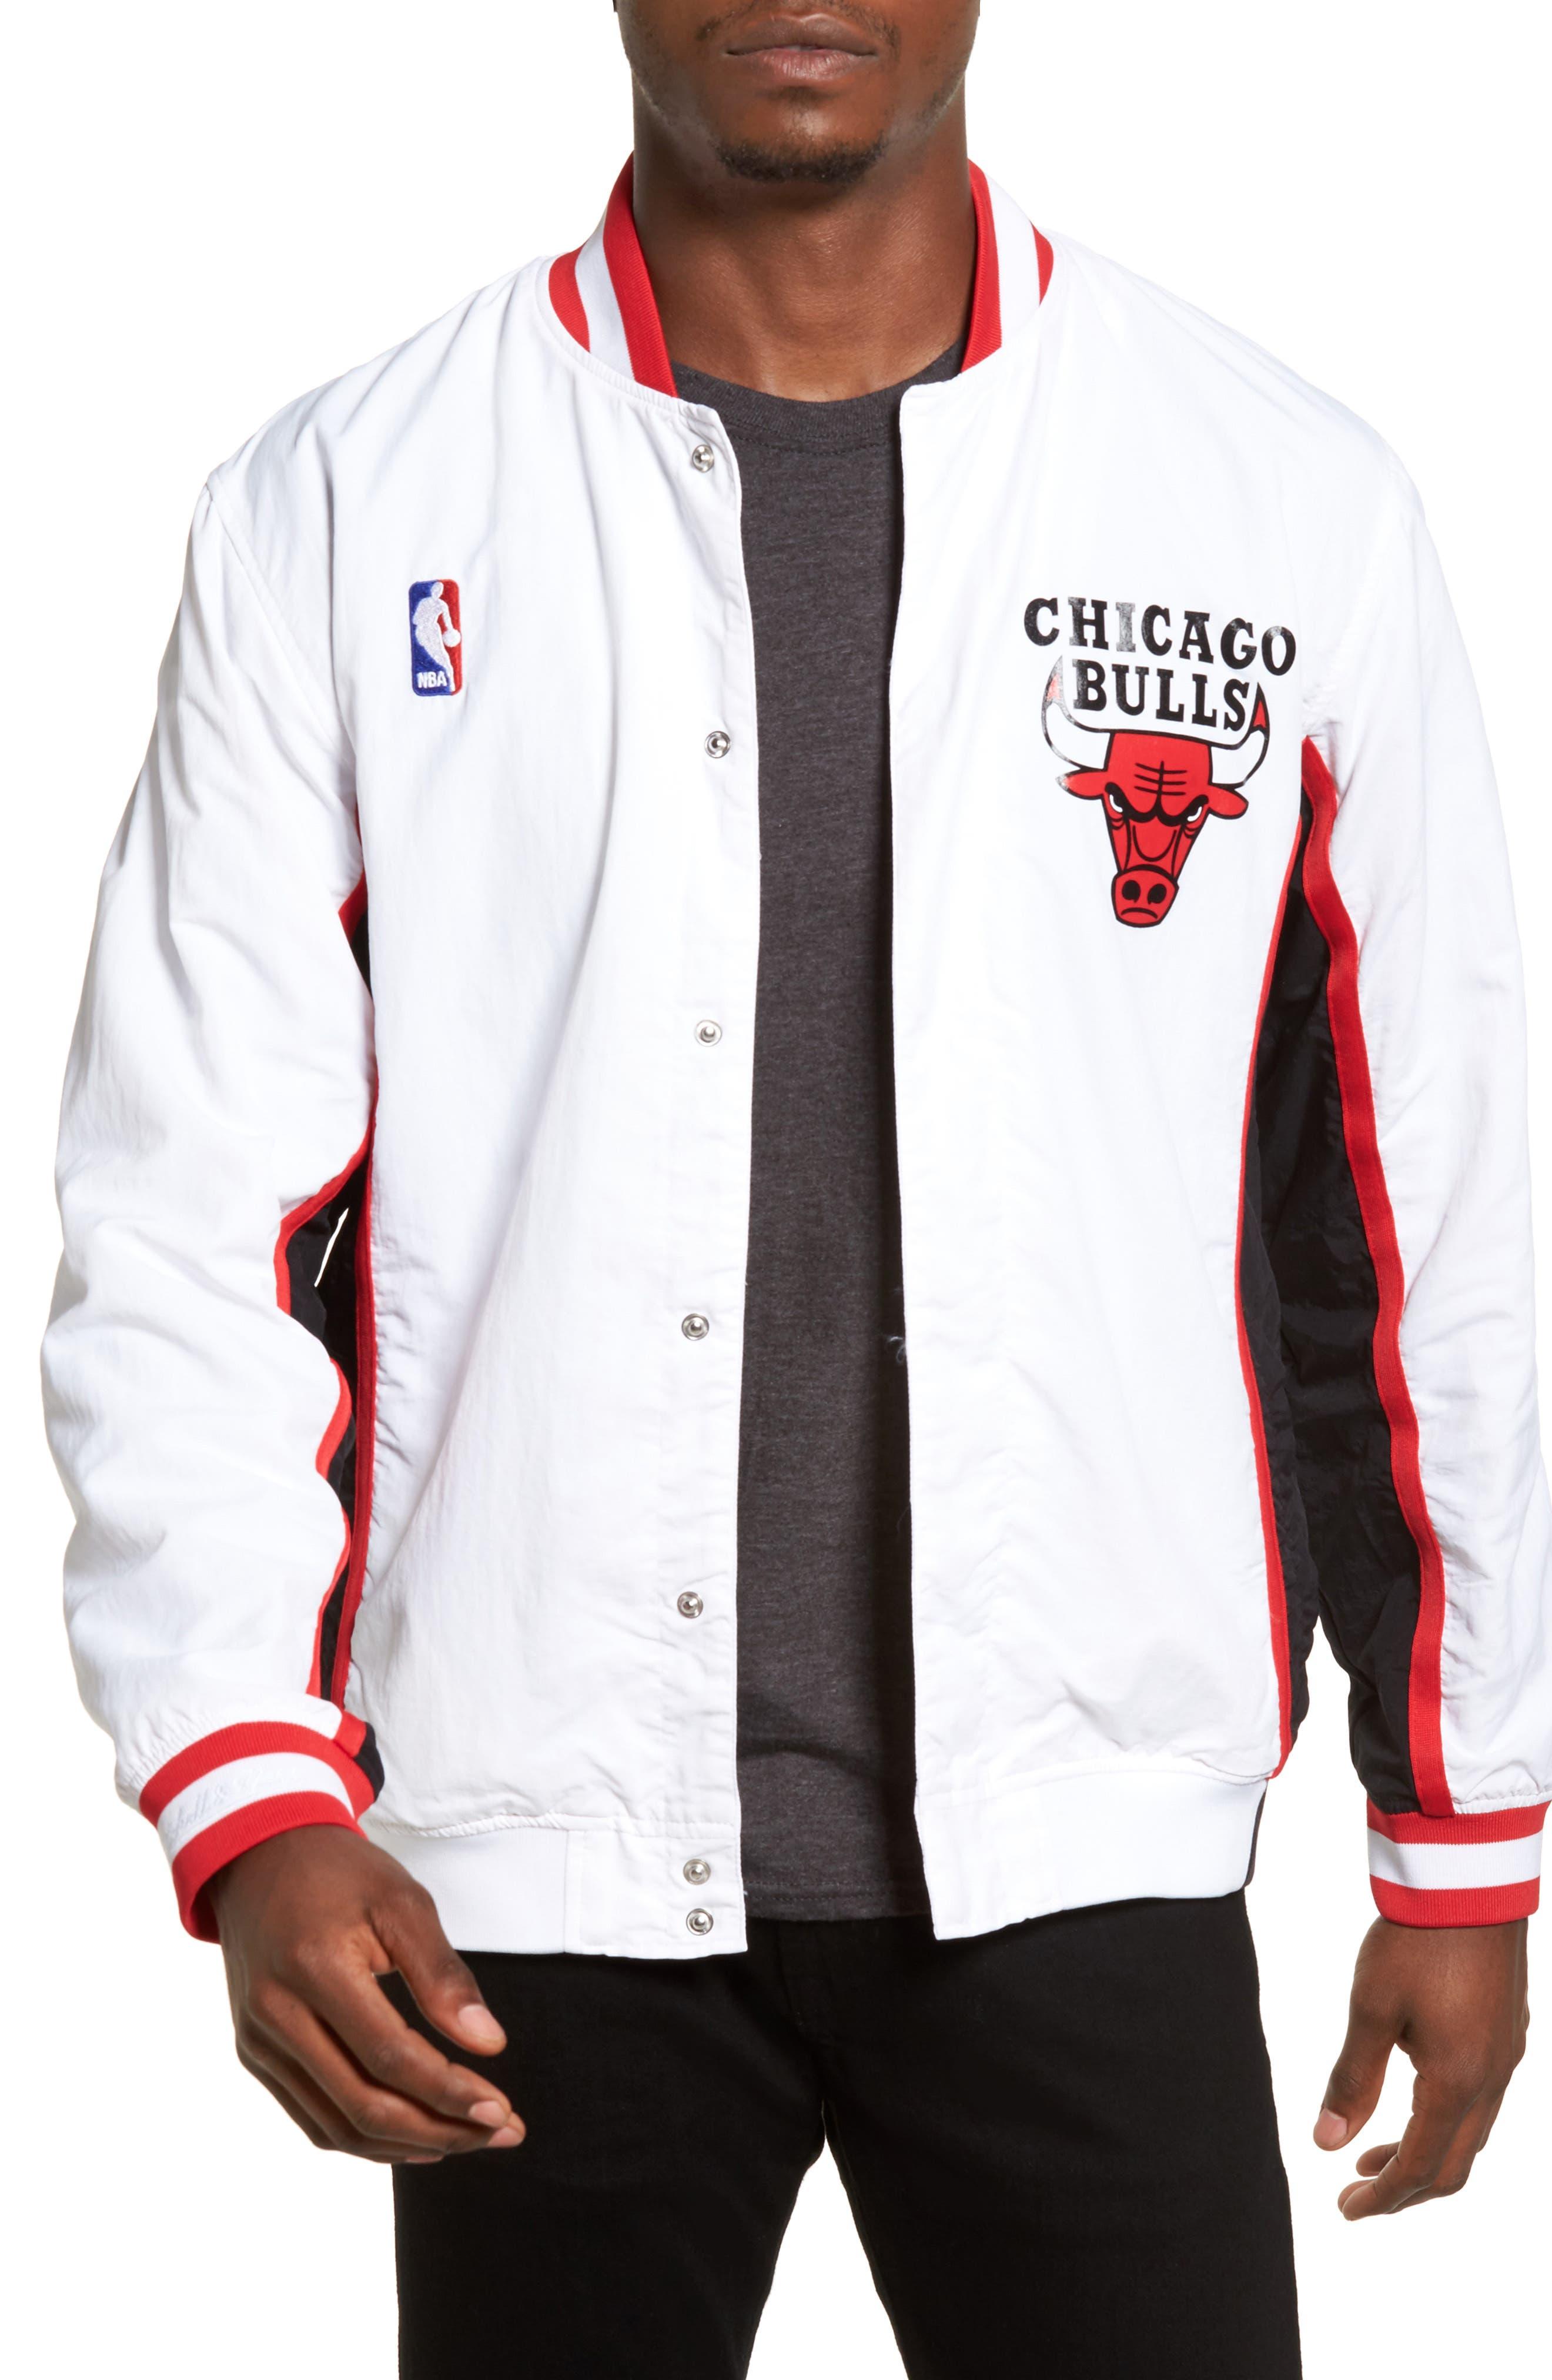 Mitchell /& Ness The Chicago Bulls Warm Up Jacket